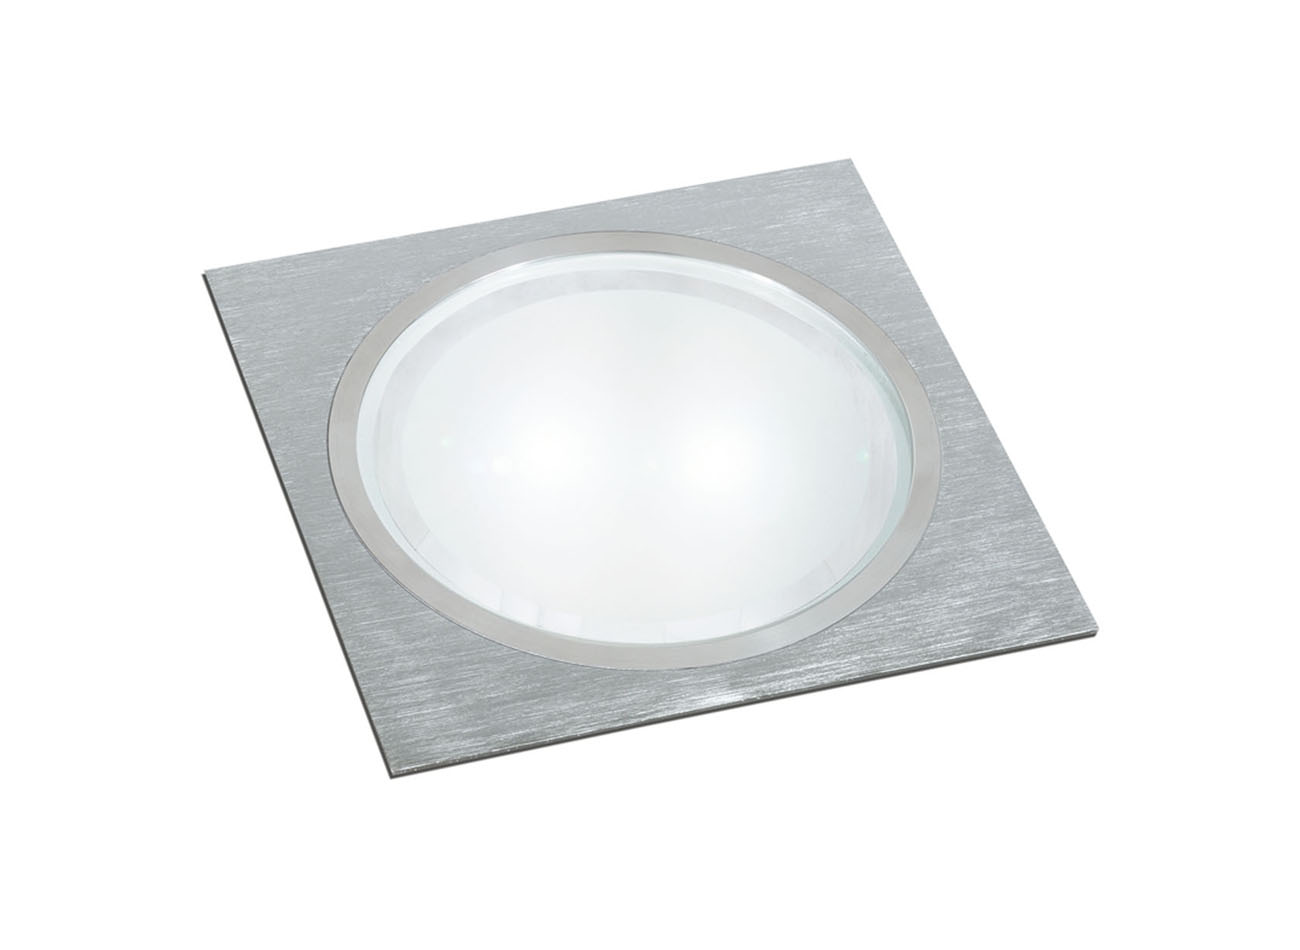 bpm lighting 3061 downlight cuadrado 2x18w g24q 3 3061. Black Bedroom Furniture Sets. Home Design Ideas